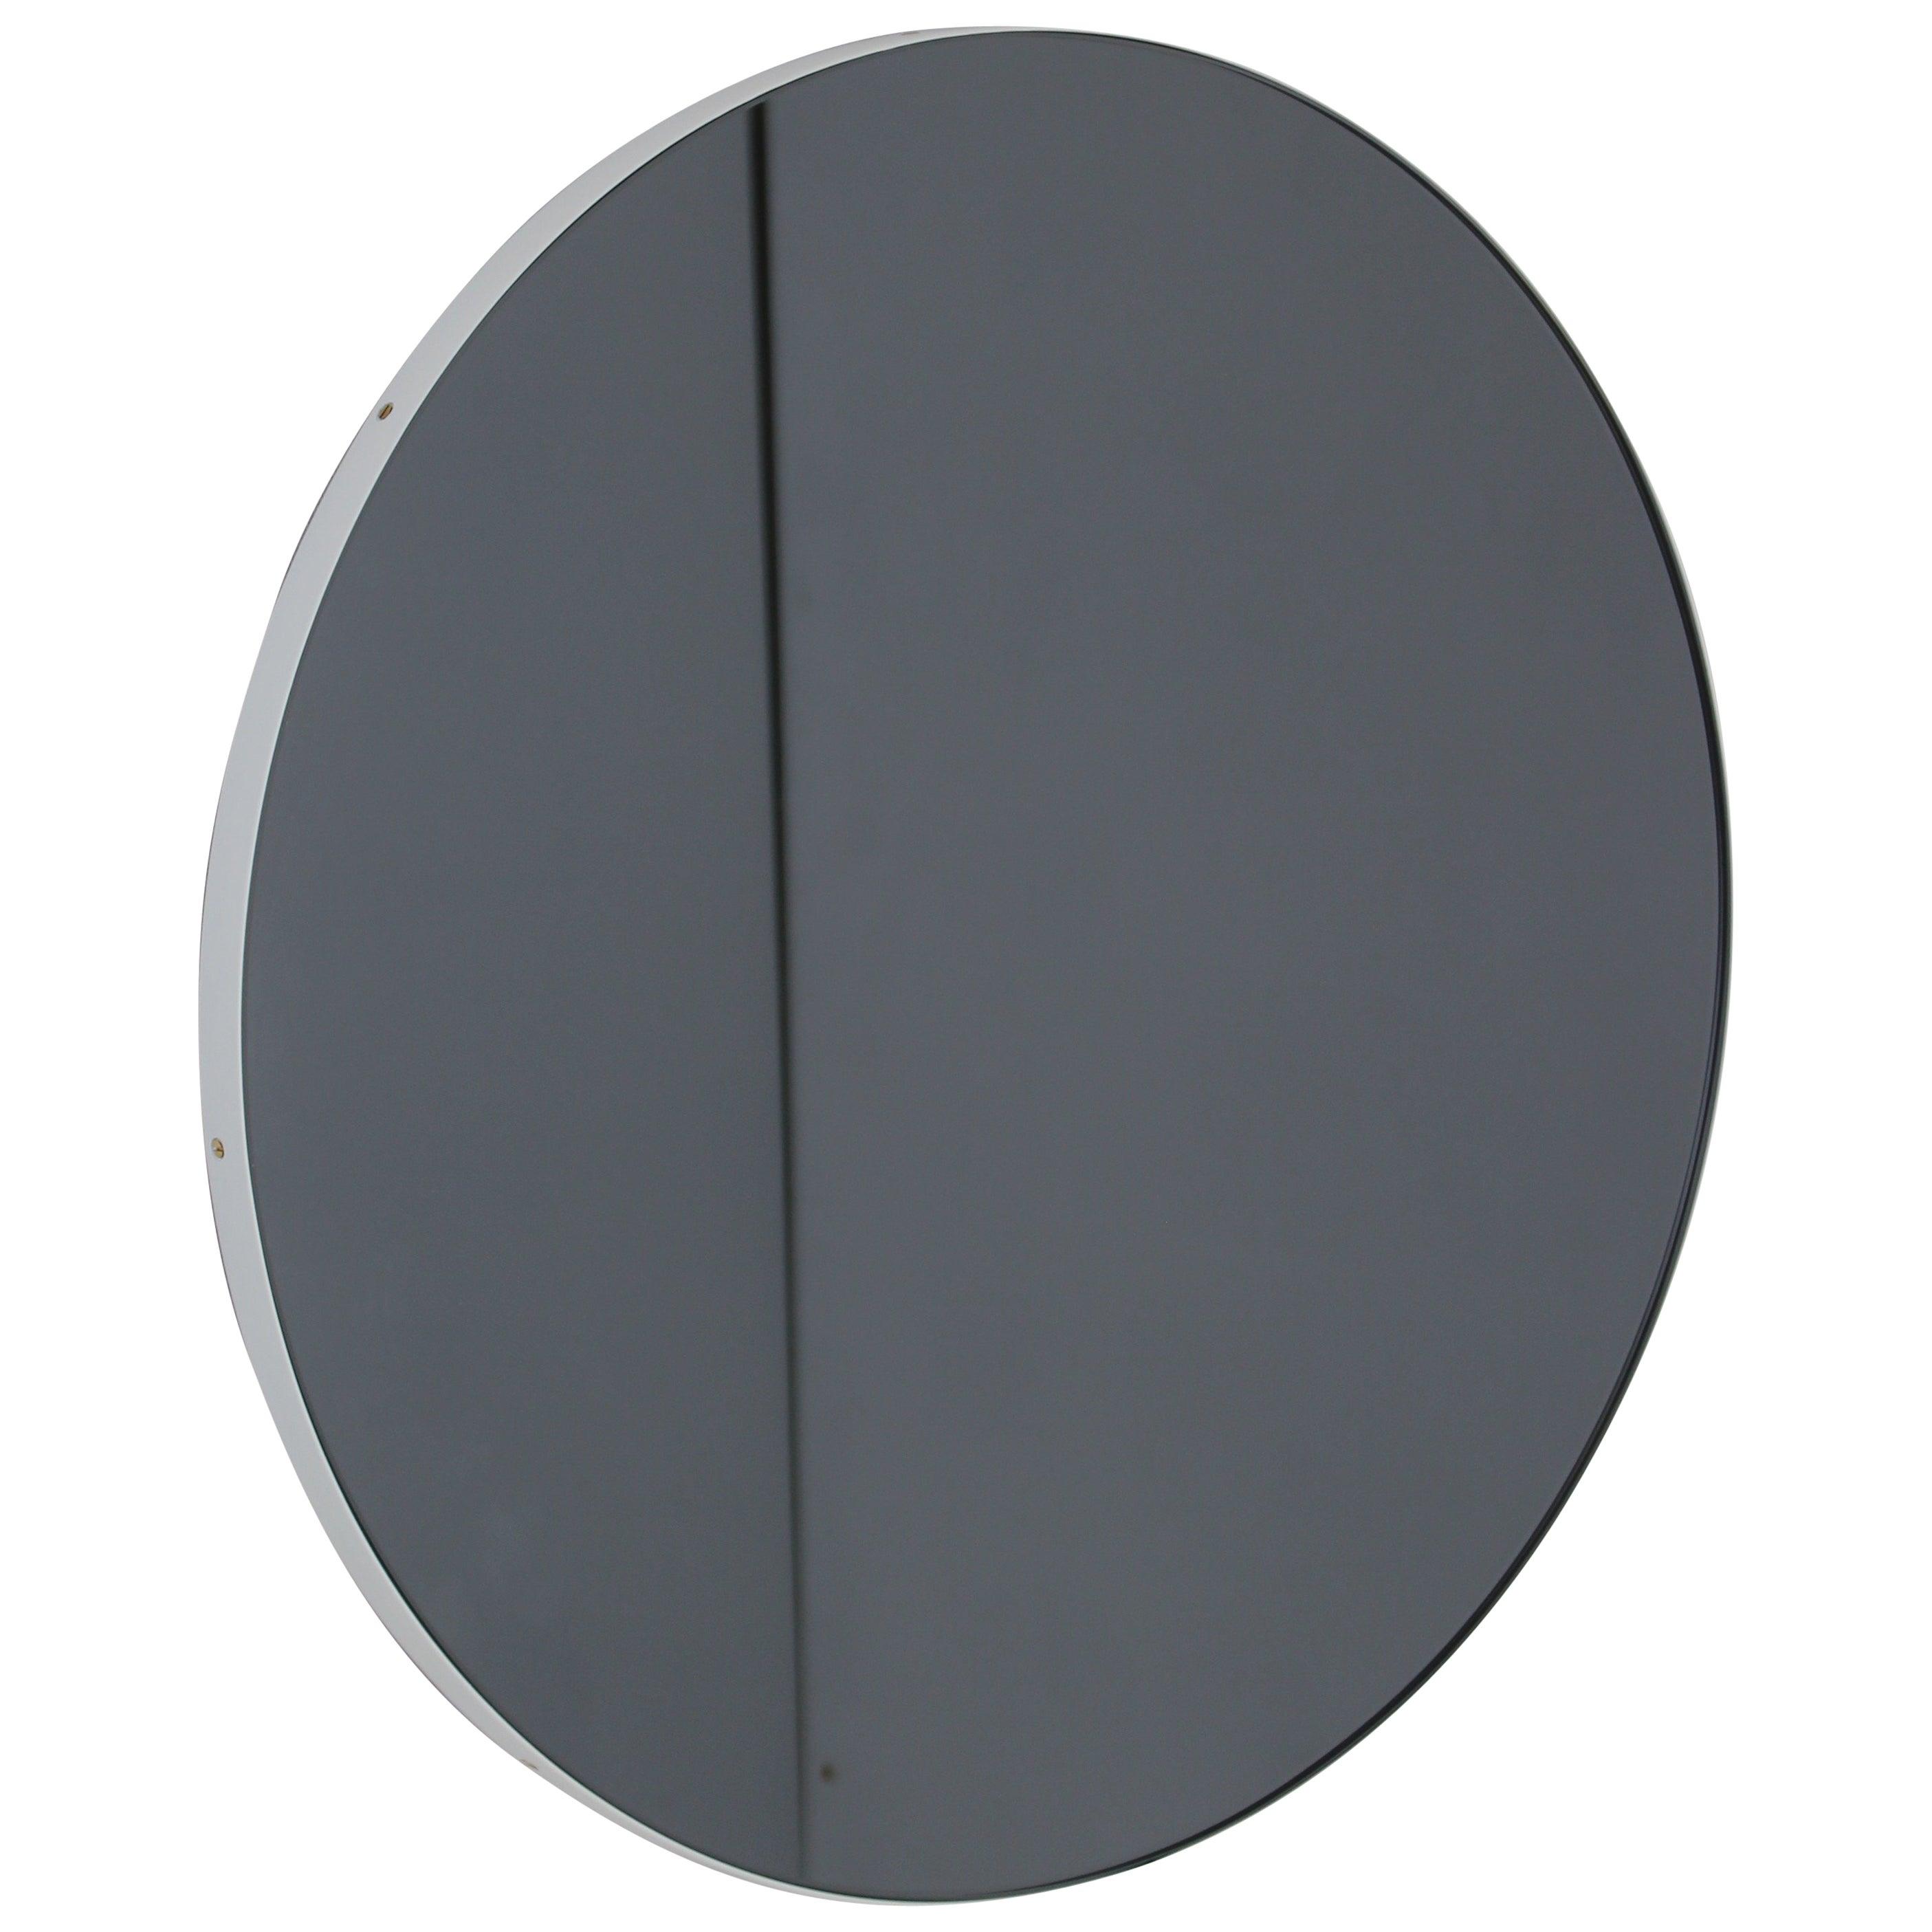 Orbis™ Round Black Tinted Modern Art Deco Mirror with White Frame - Oversized